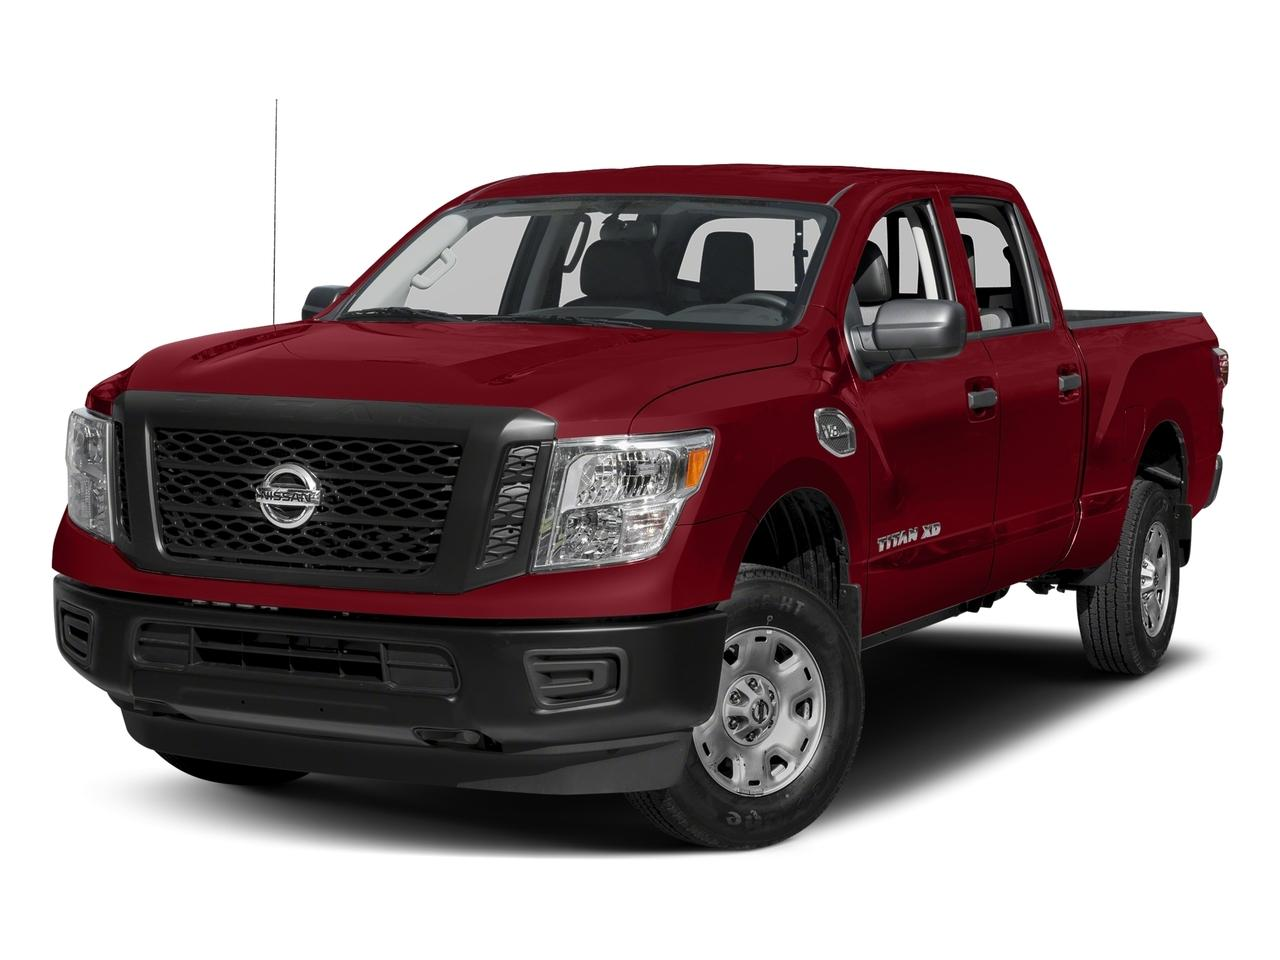 2016 Nissan Titan XD Vehicle Photo in TEMPLE, TX 76504-3447